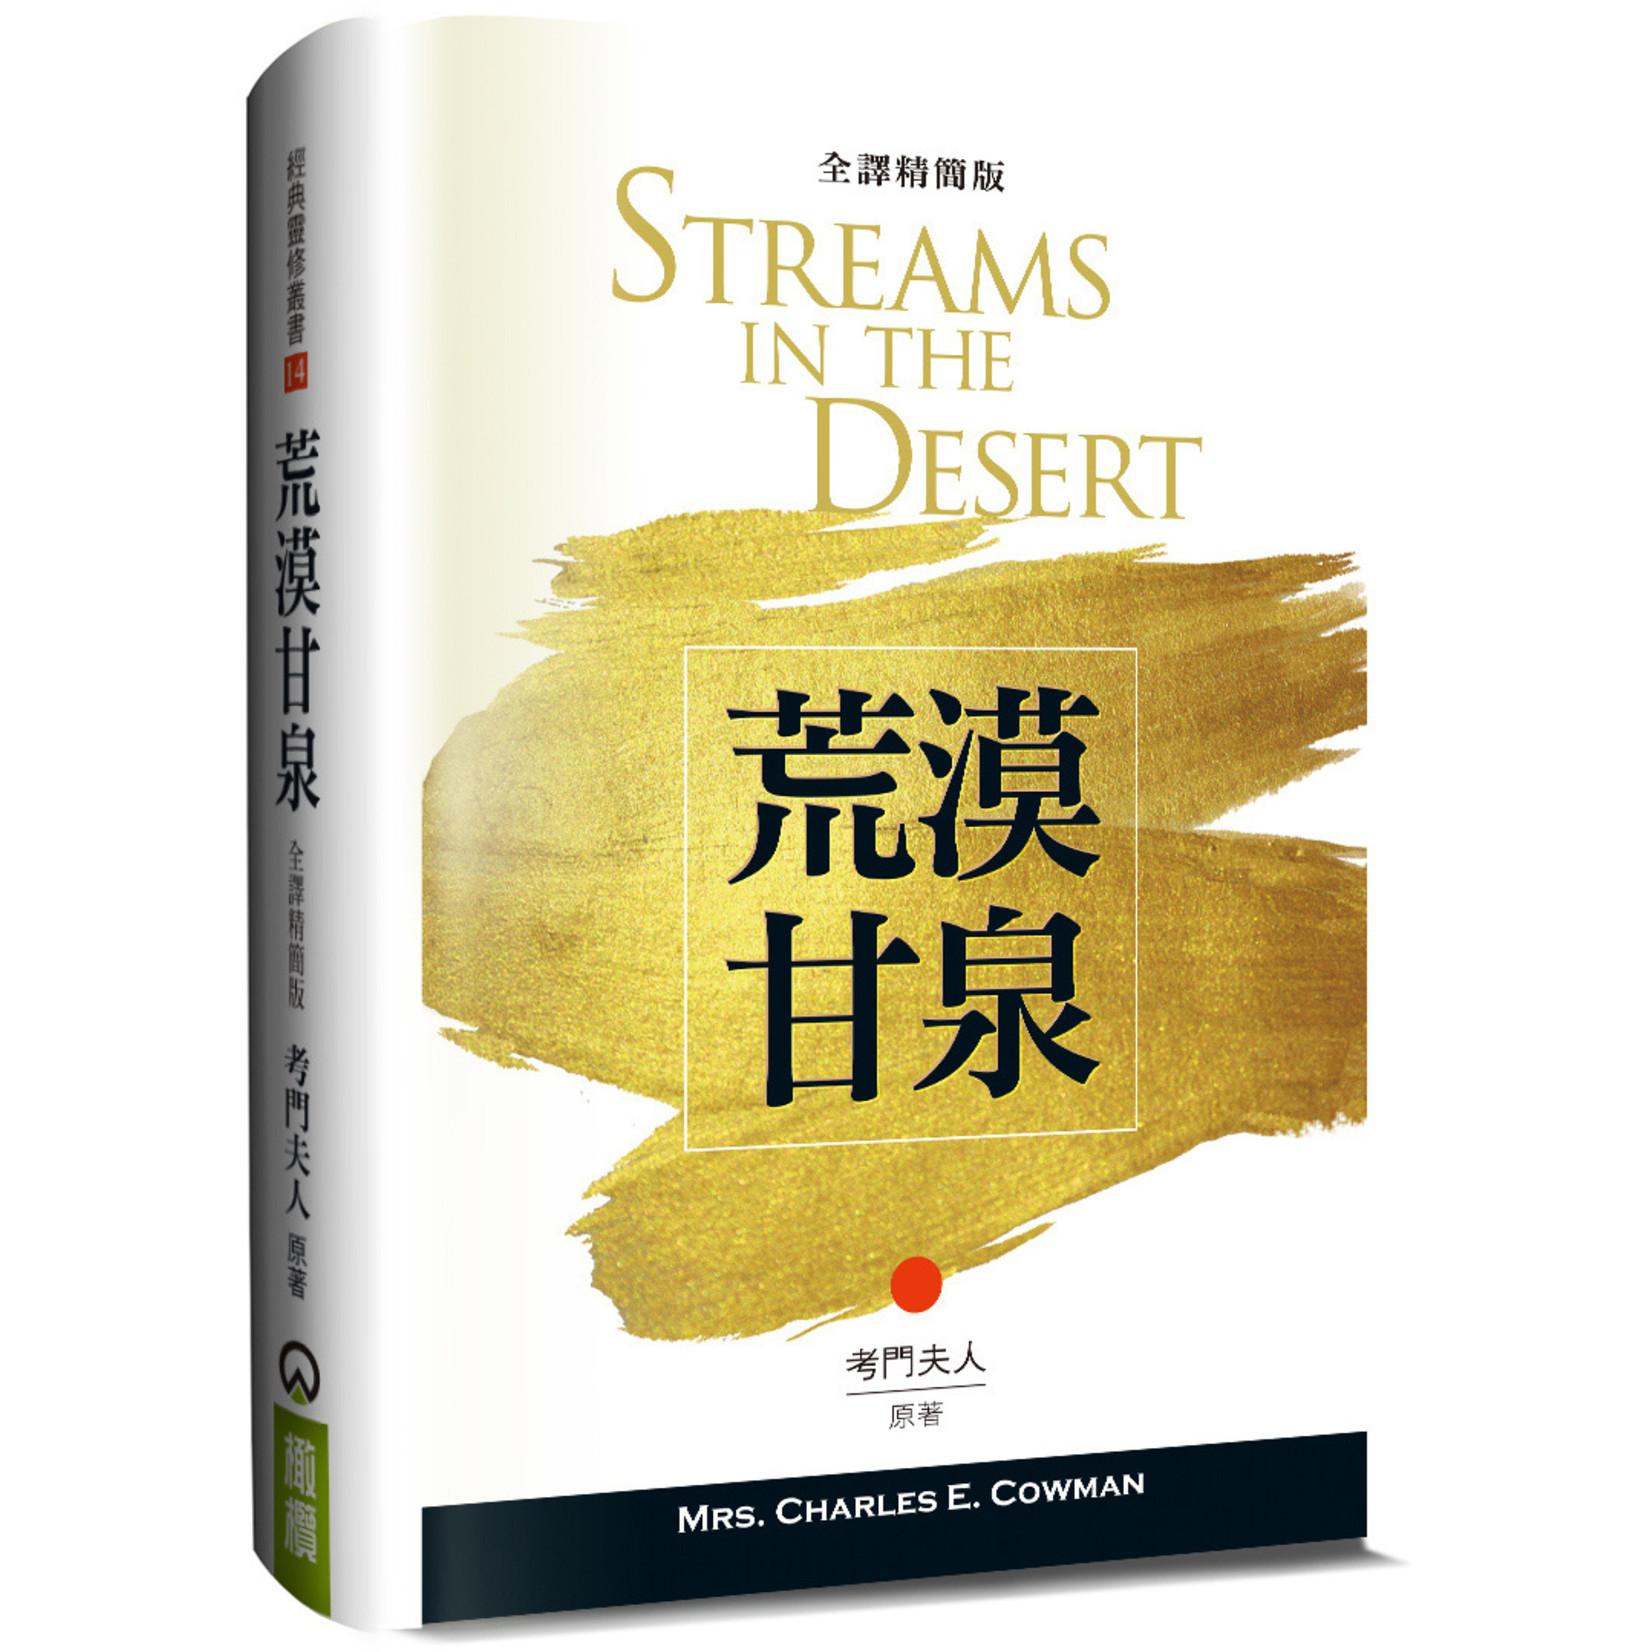 橄欖 Olive Press 荒漠甘泉(全譯精簡版) Streams in the Desert